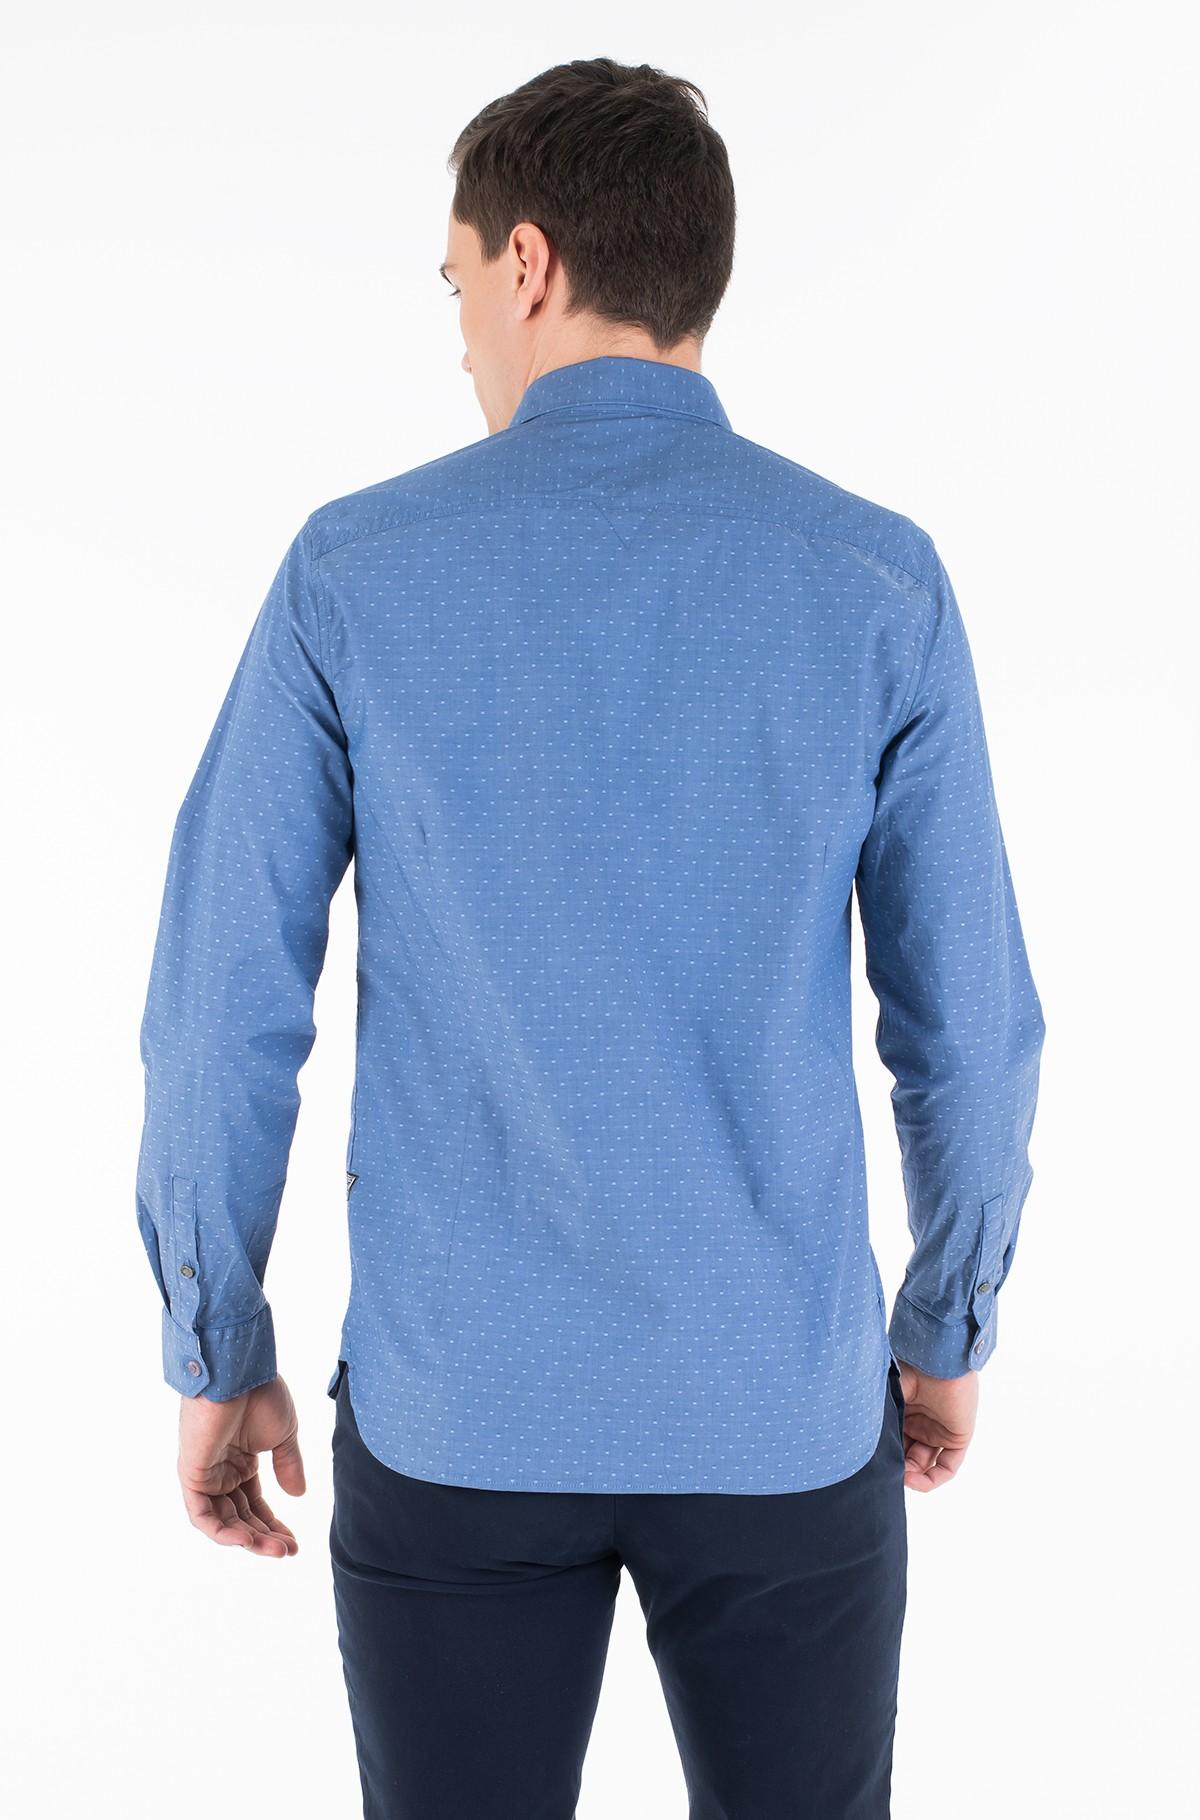 Marškiniai M01H13 WCJQ0-full-3